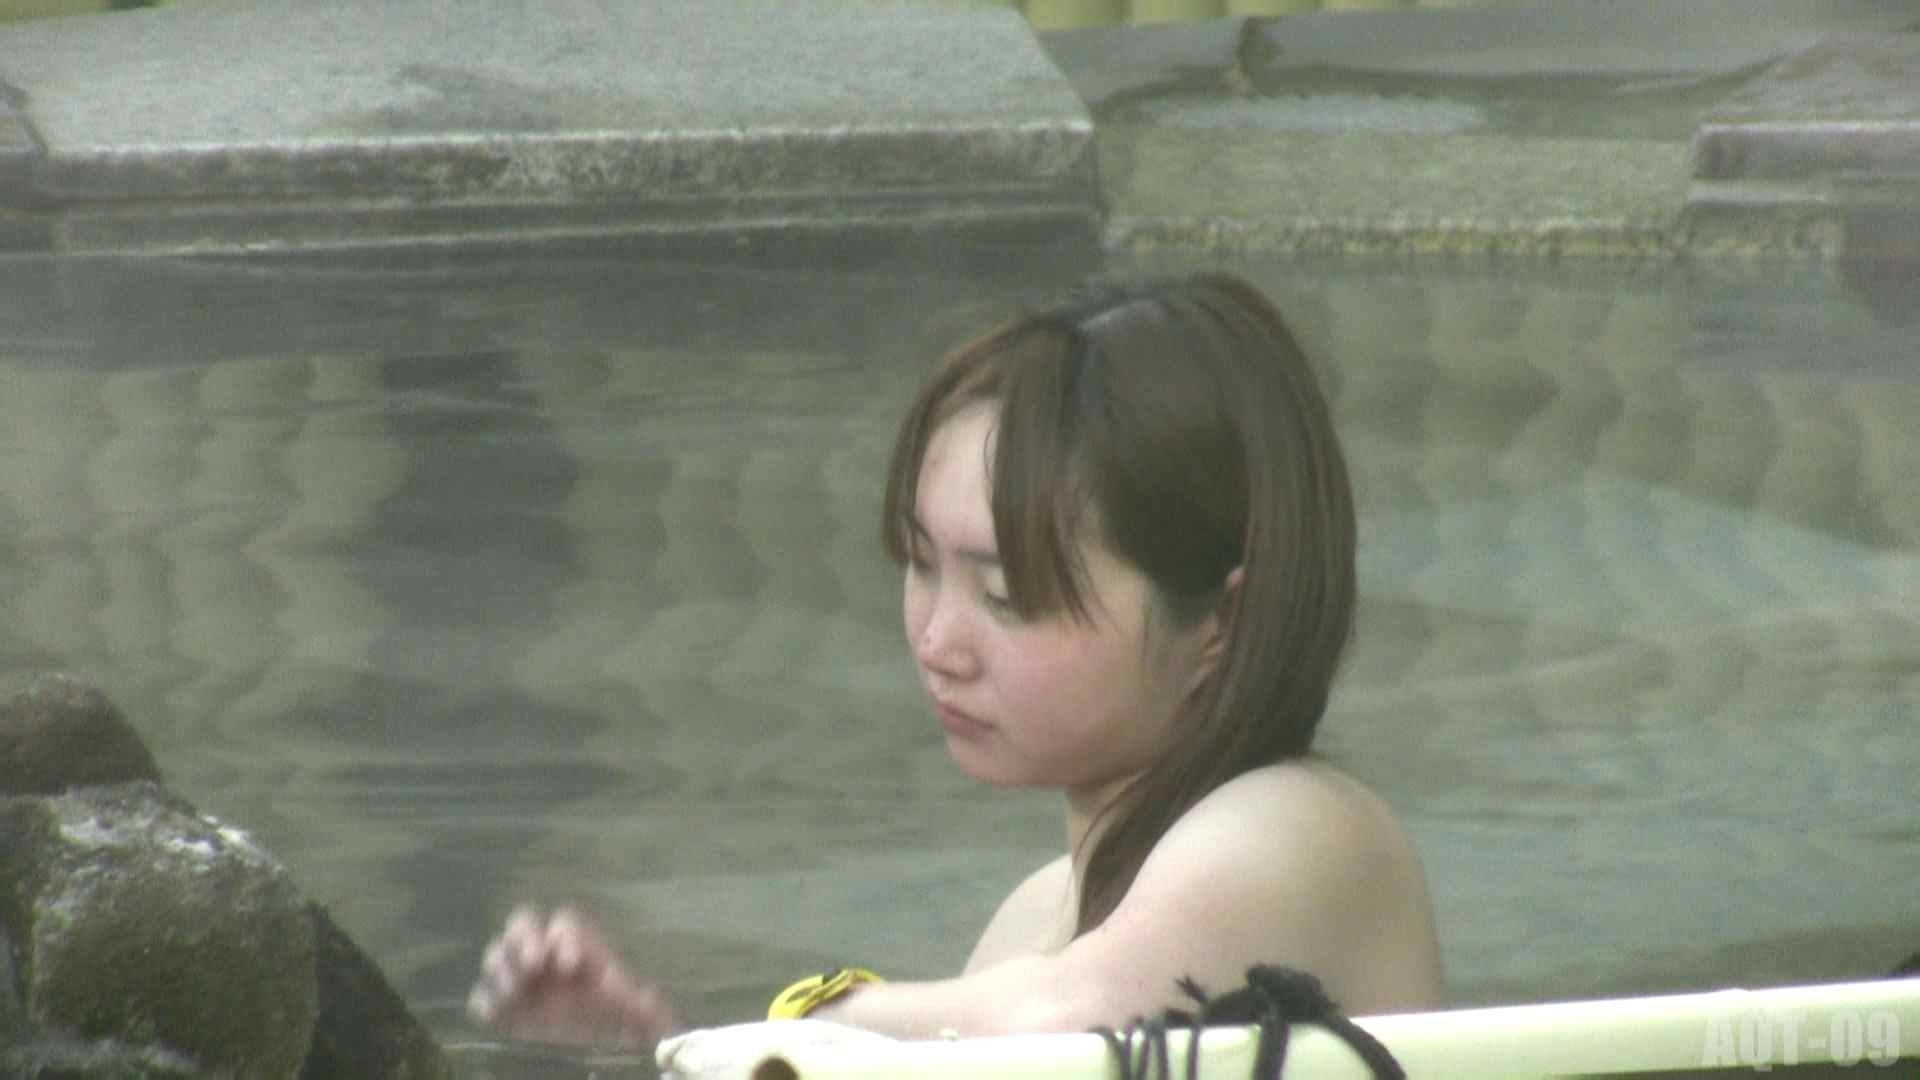 Aquaな露天風呂Vol.781 盗撮 濡れ場動画紹介 93連発 53